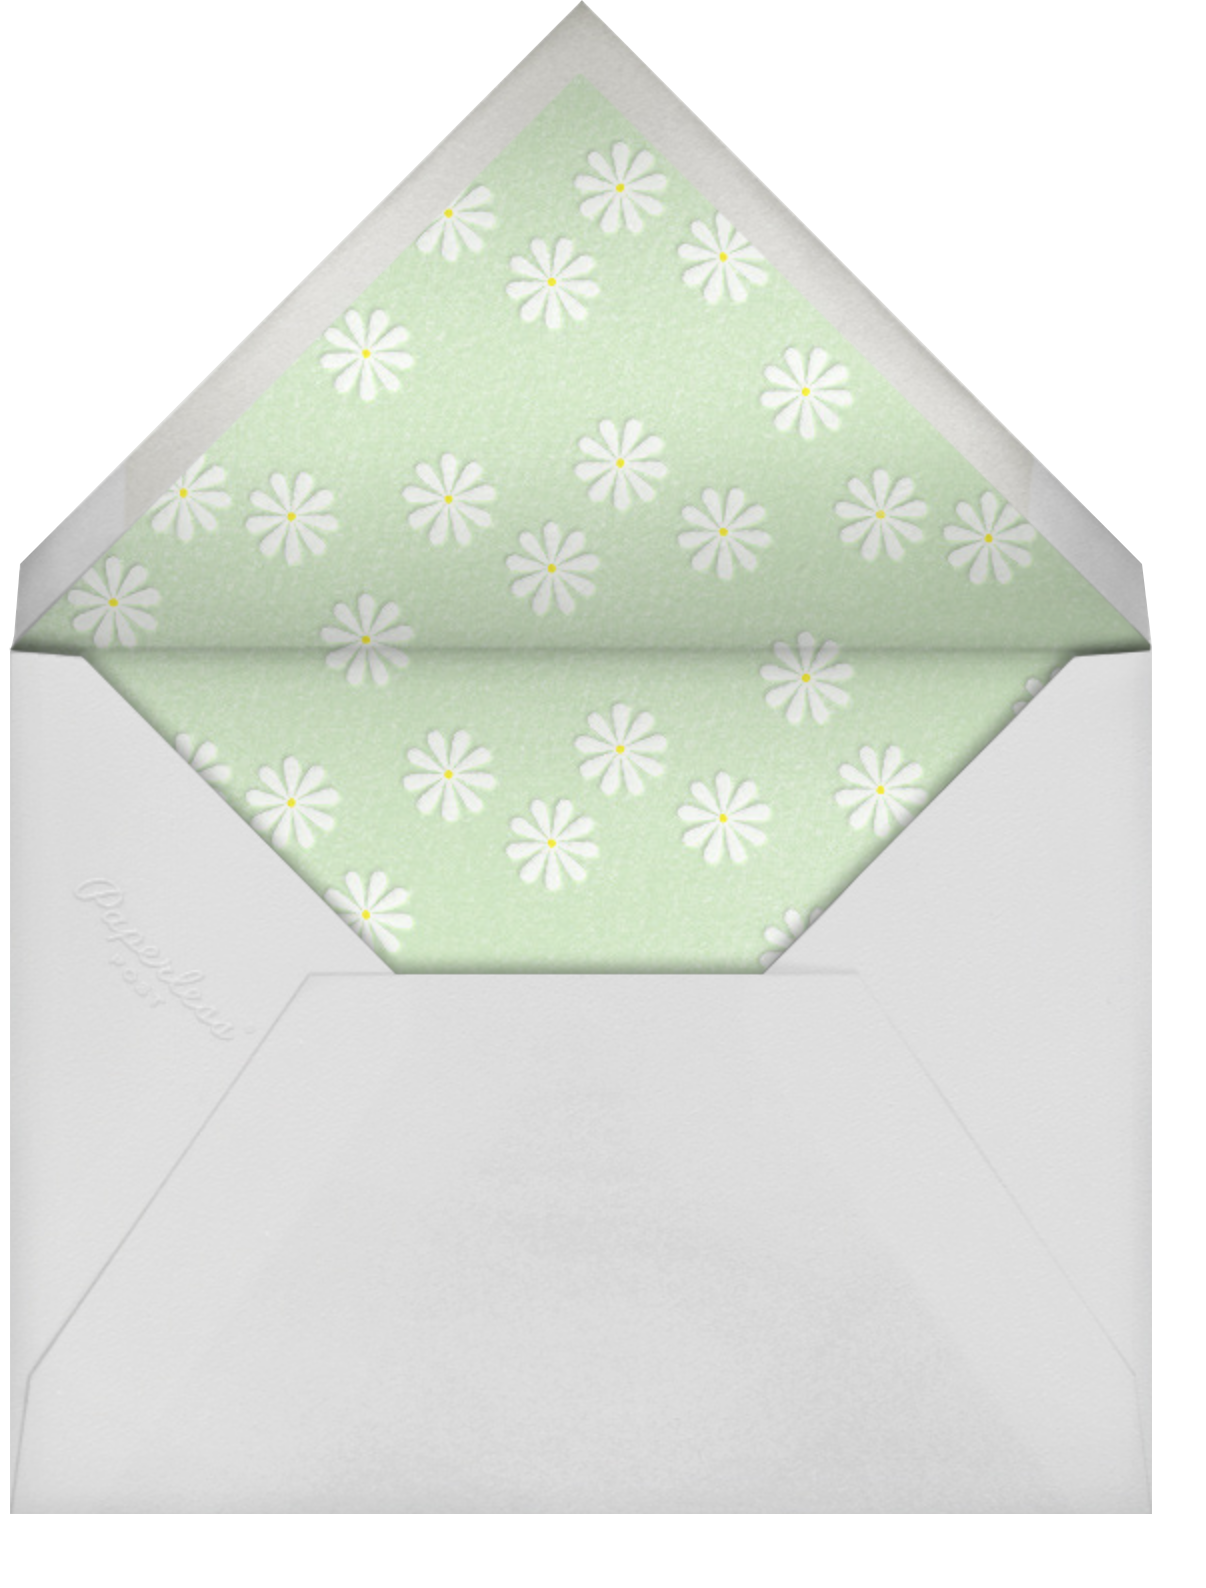 Sprawling Daisies - Paperless Post - Easter - envelope back